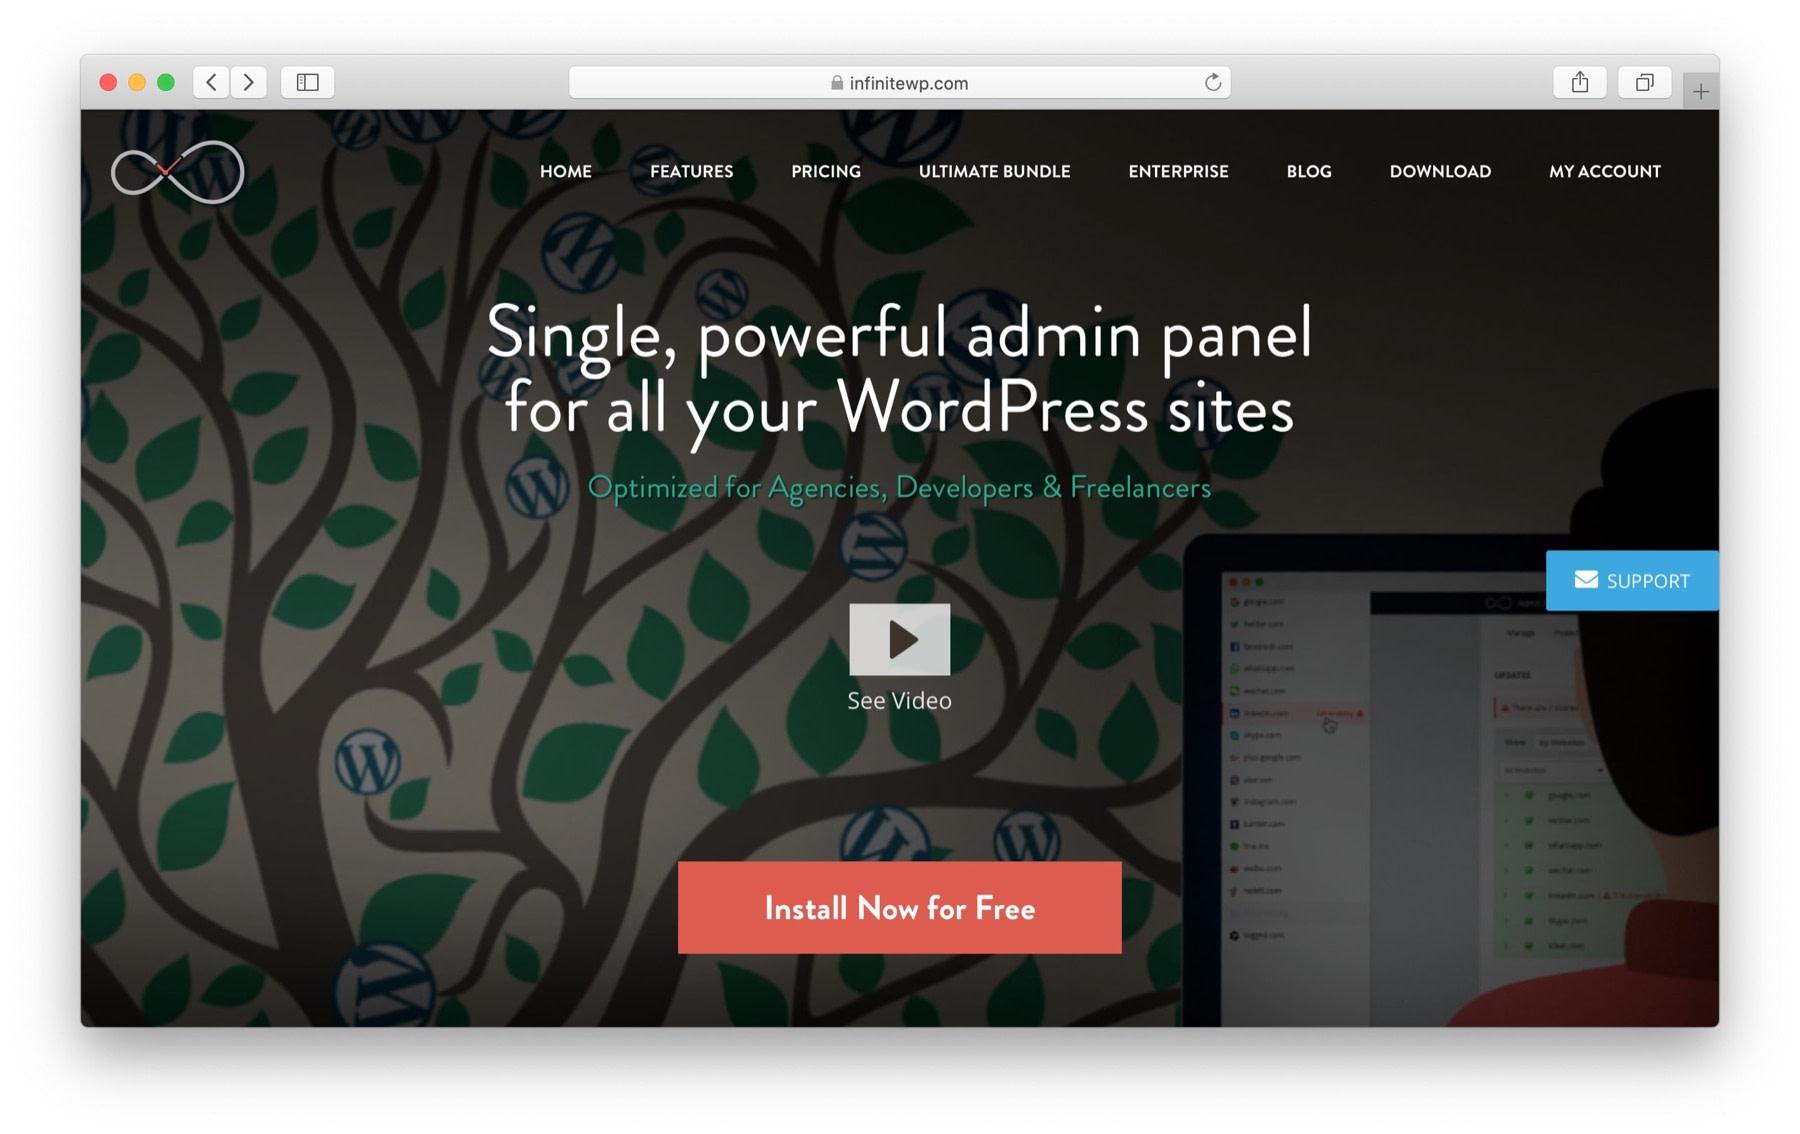 manage multiple WordPress websites: infinitewp